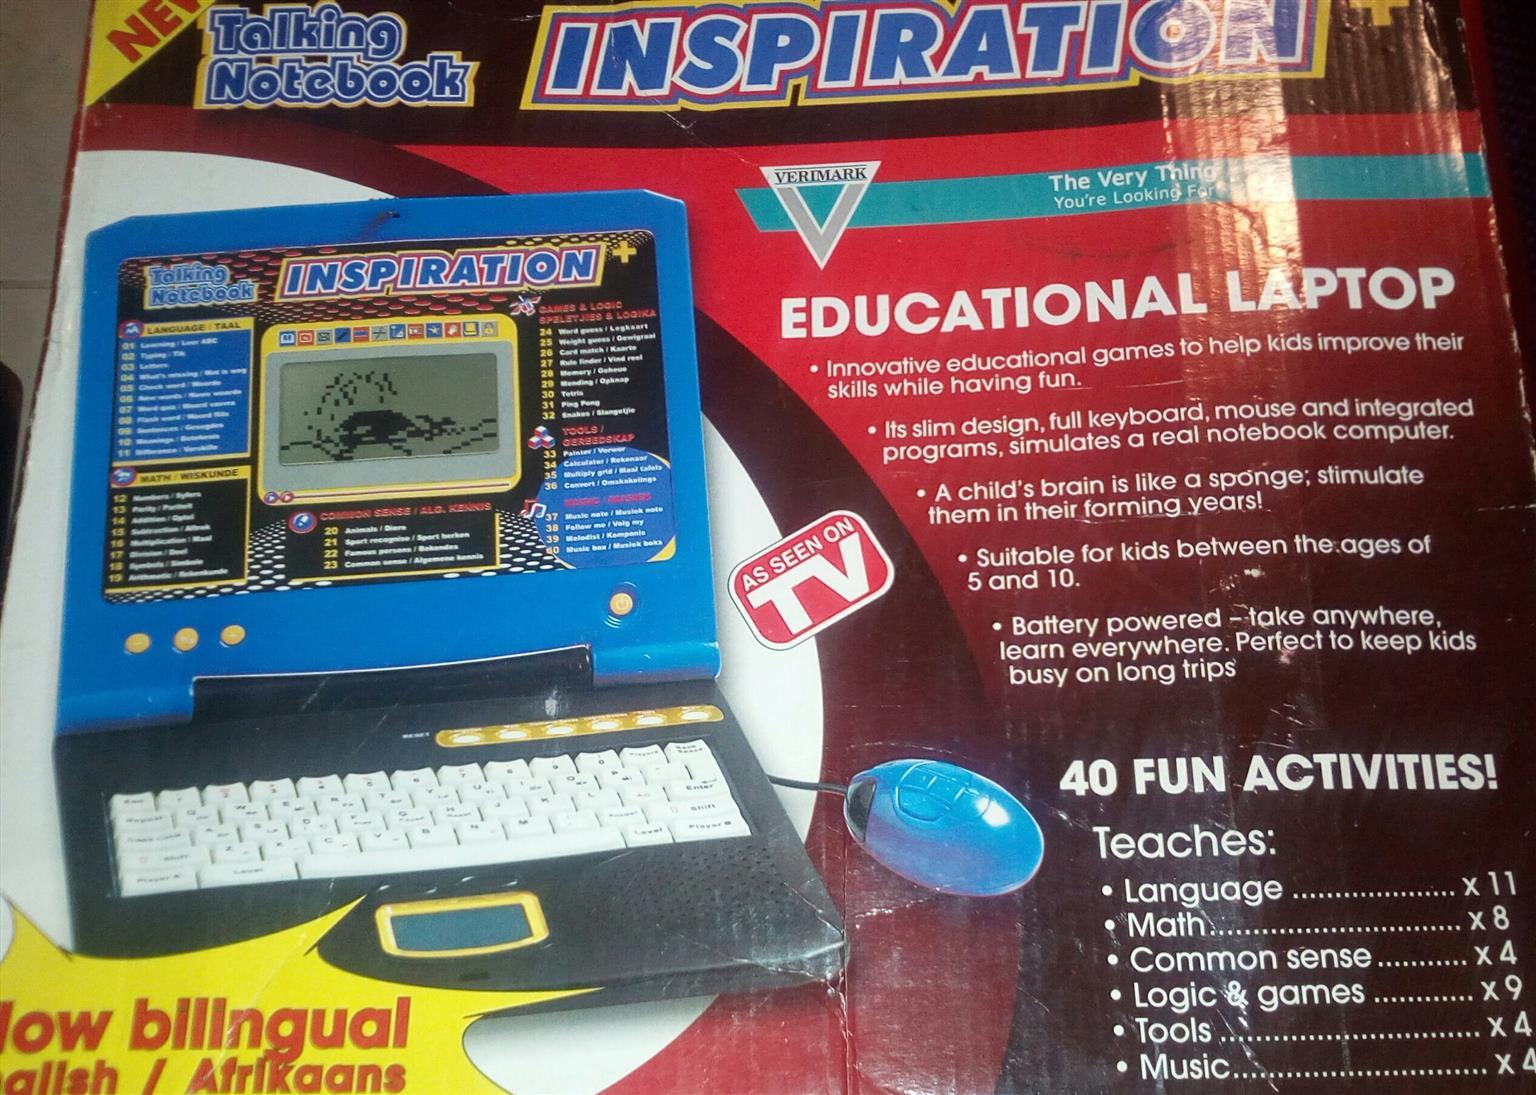 Educational laptop